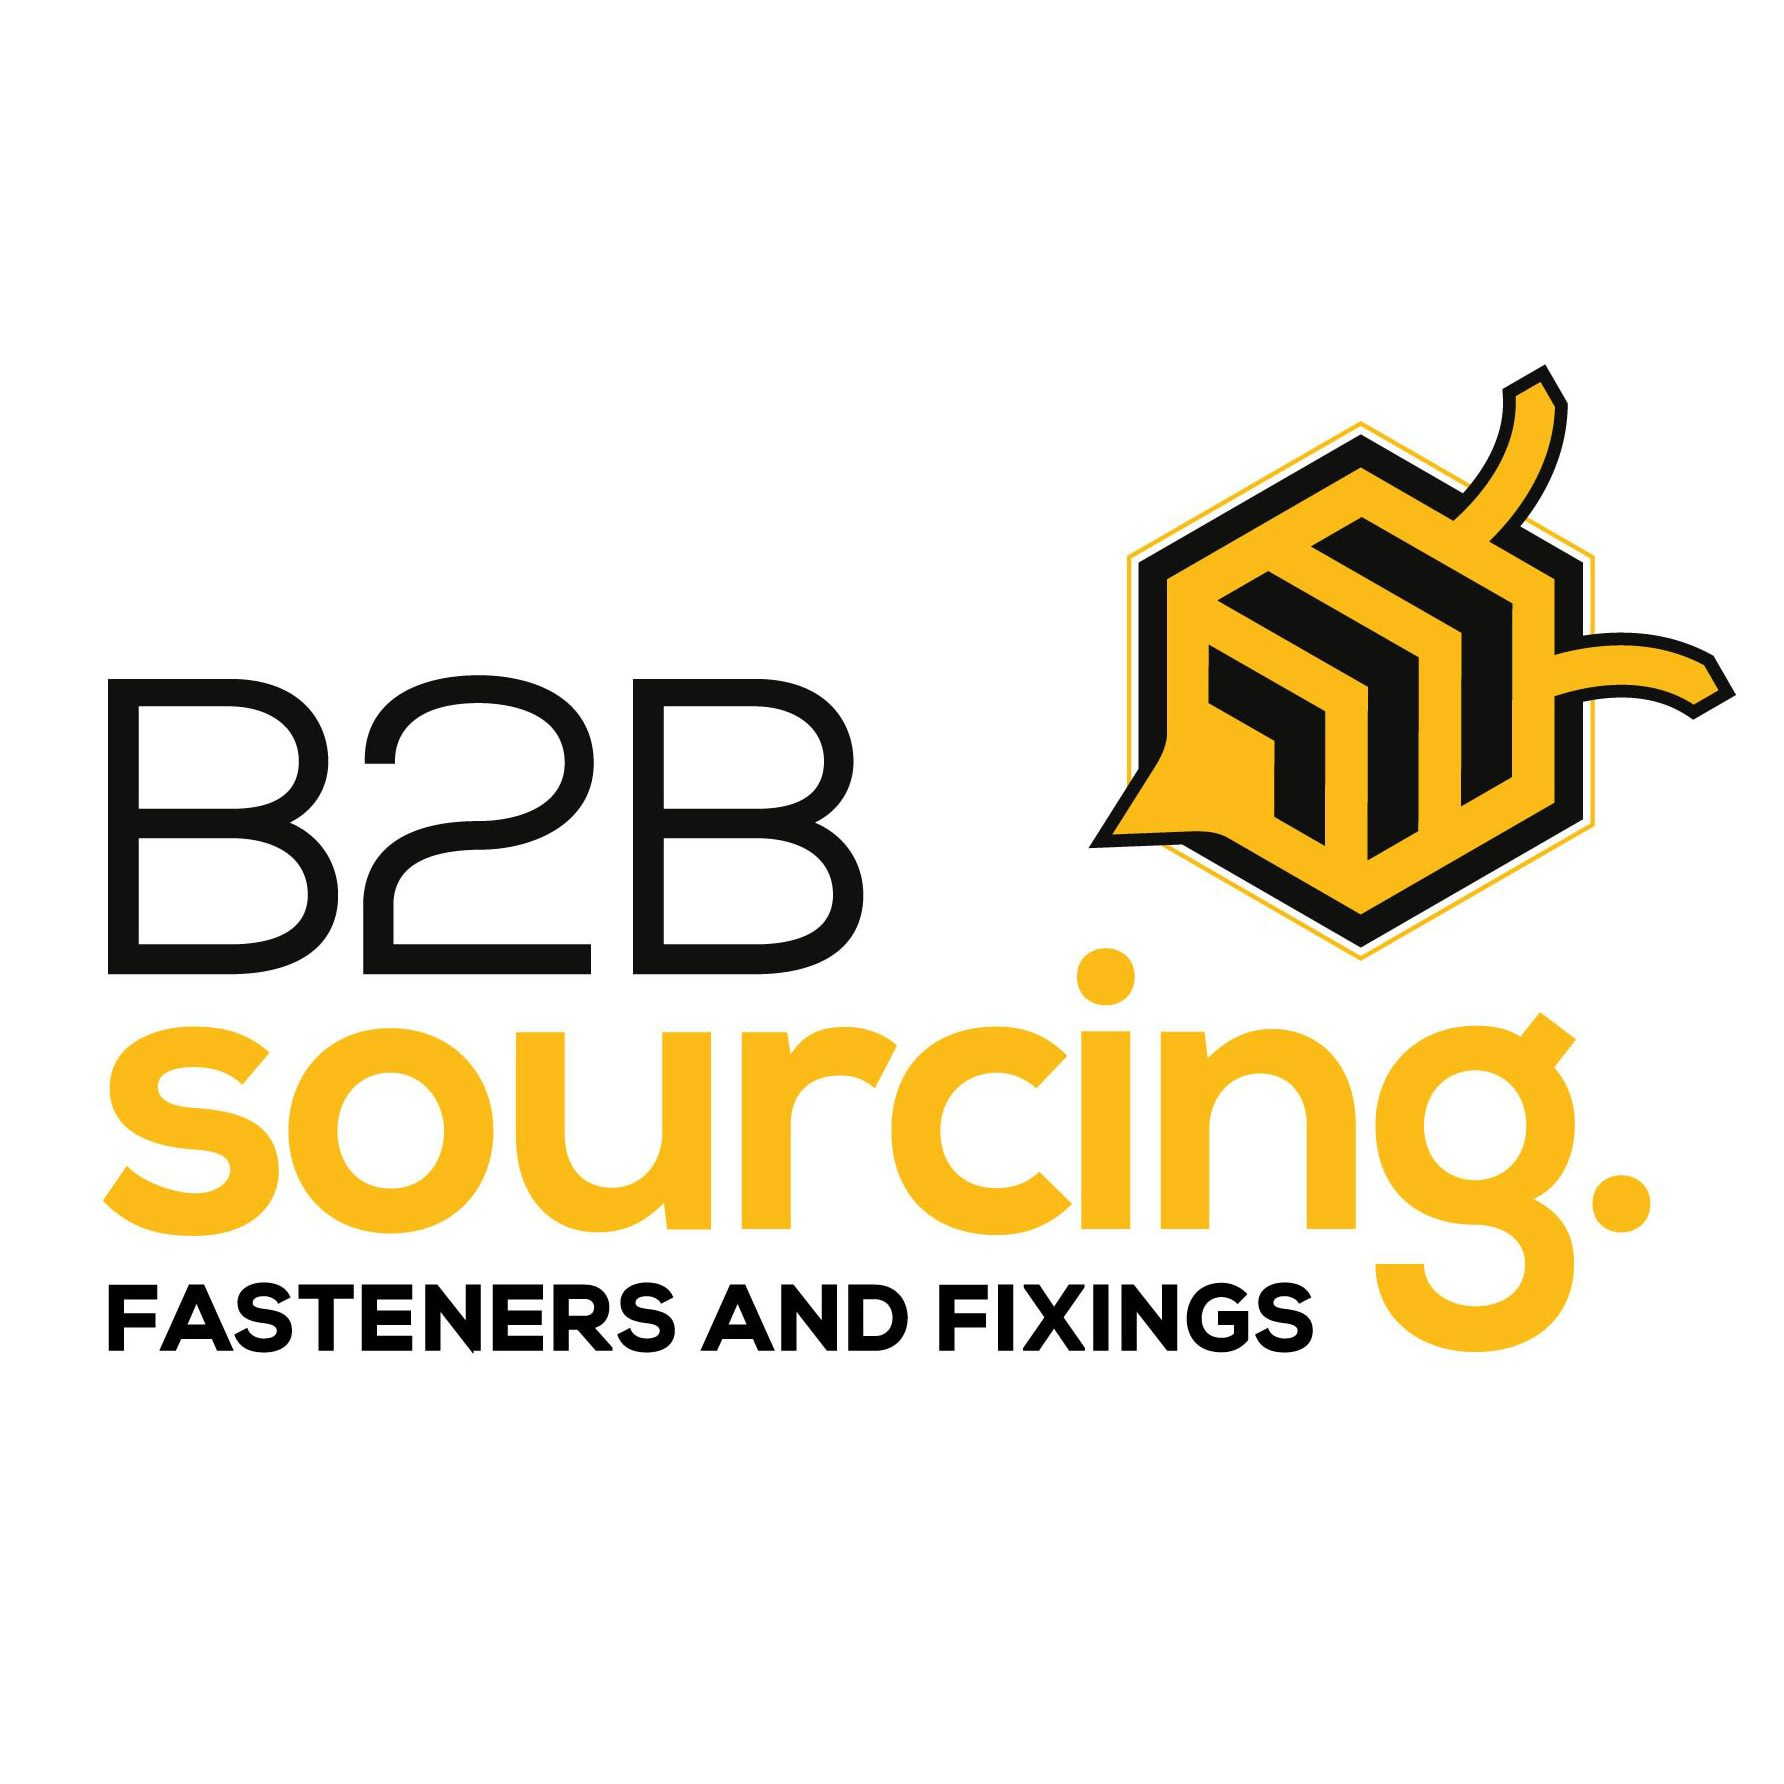 B2B Sourcing Ltd - Telford, West Midlands TF7 4QN - 01952 601080 | ShowMeLocal.com